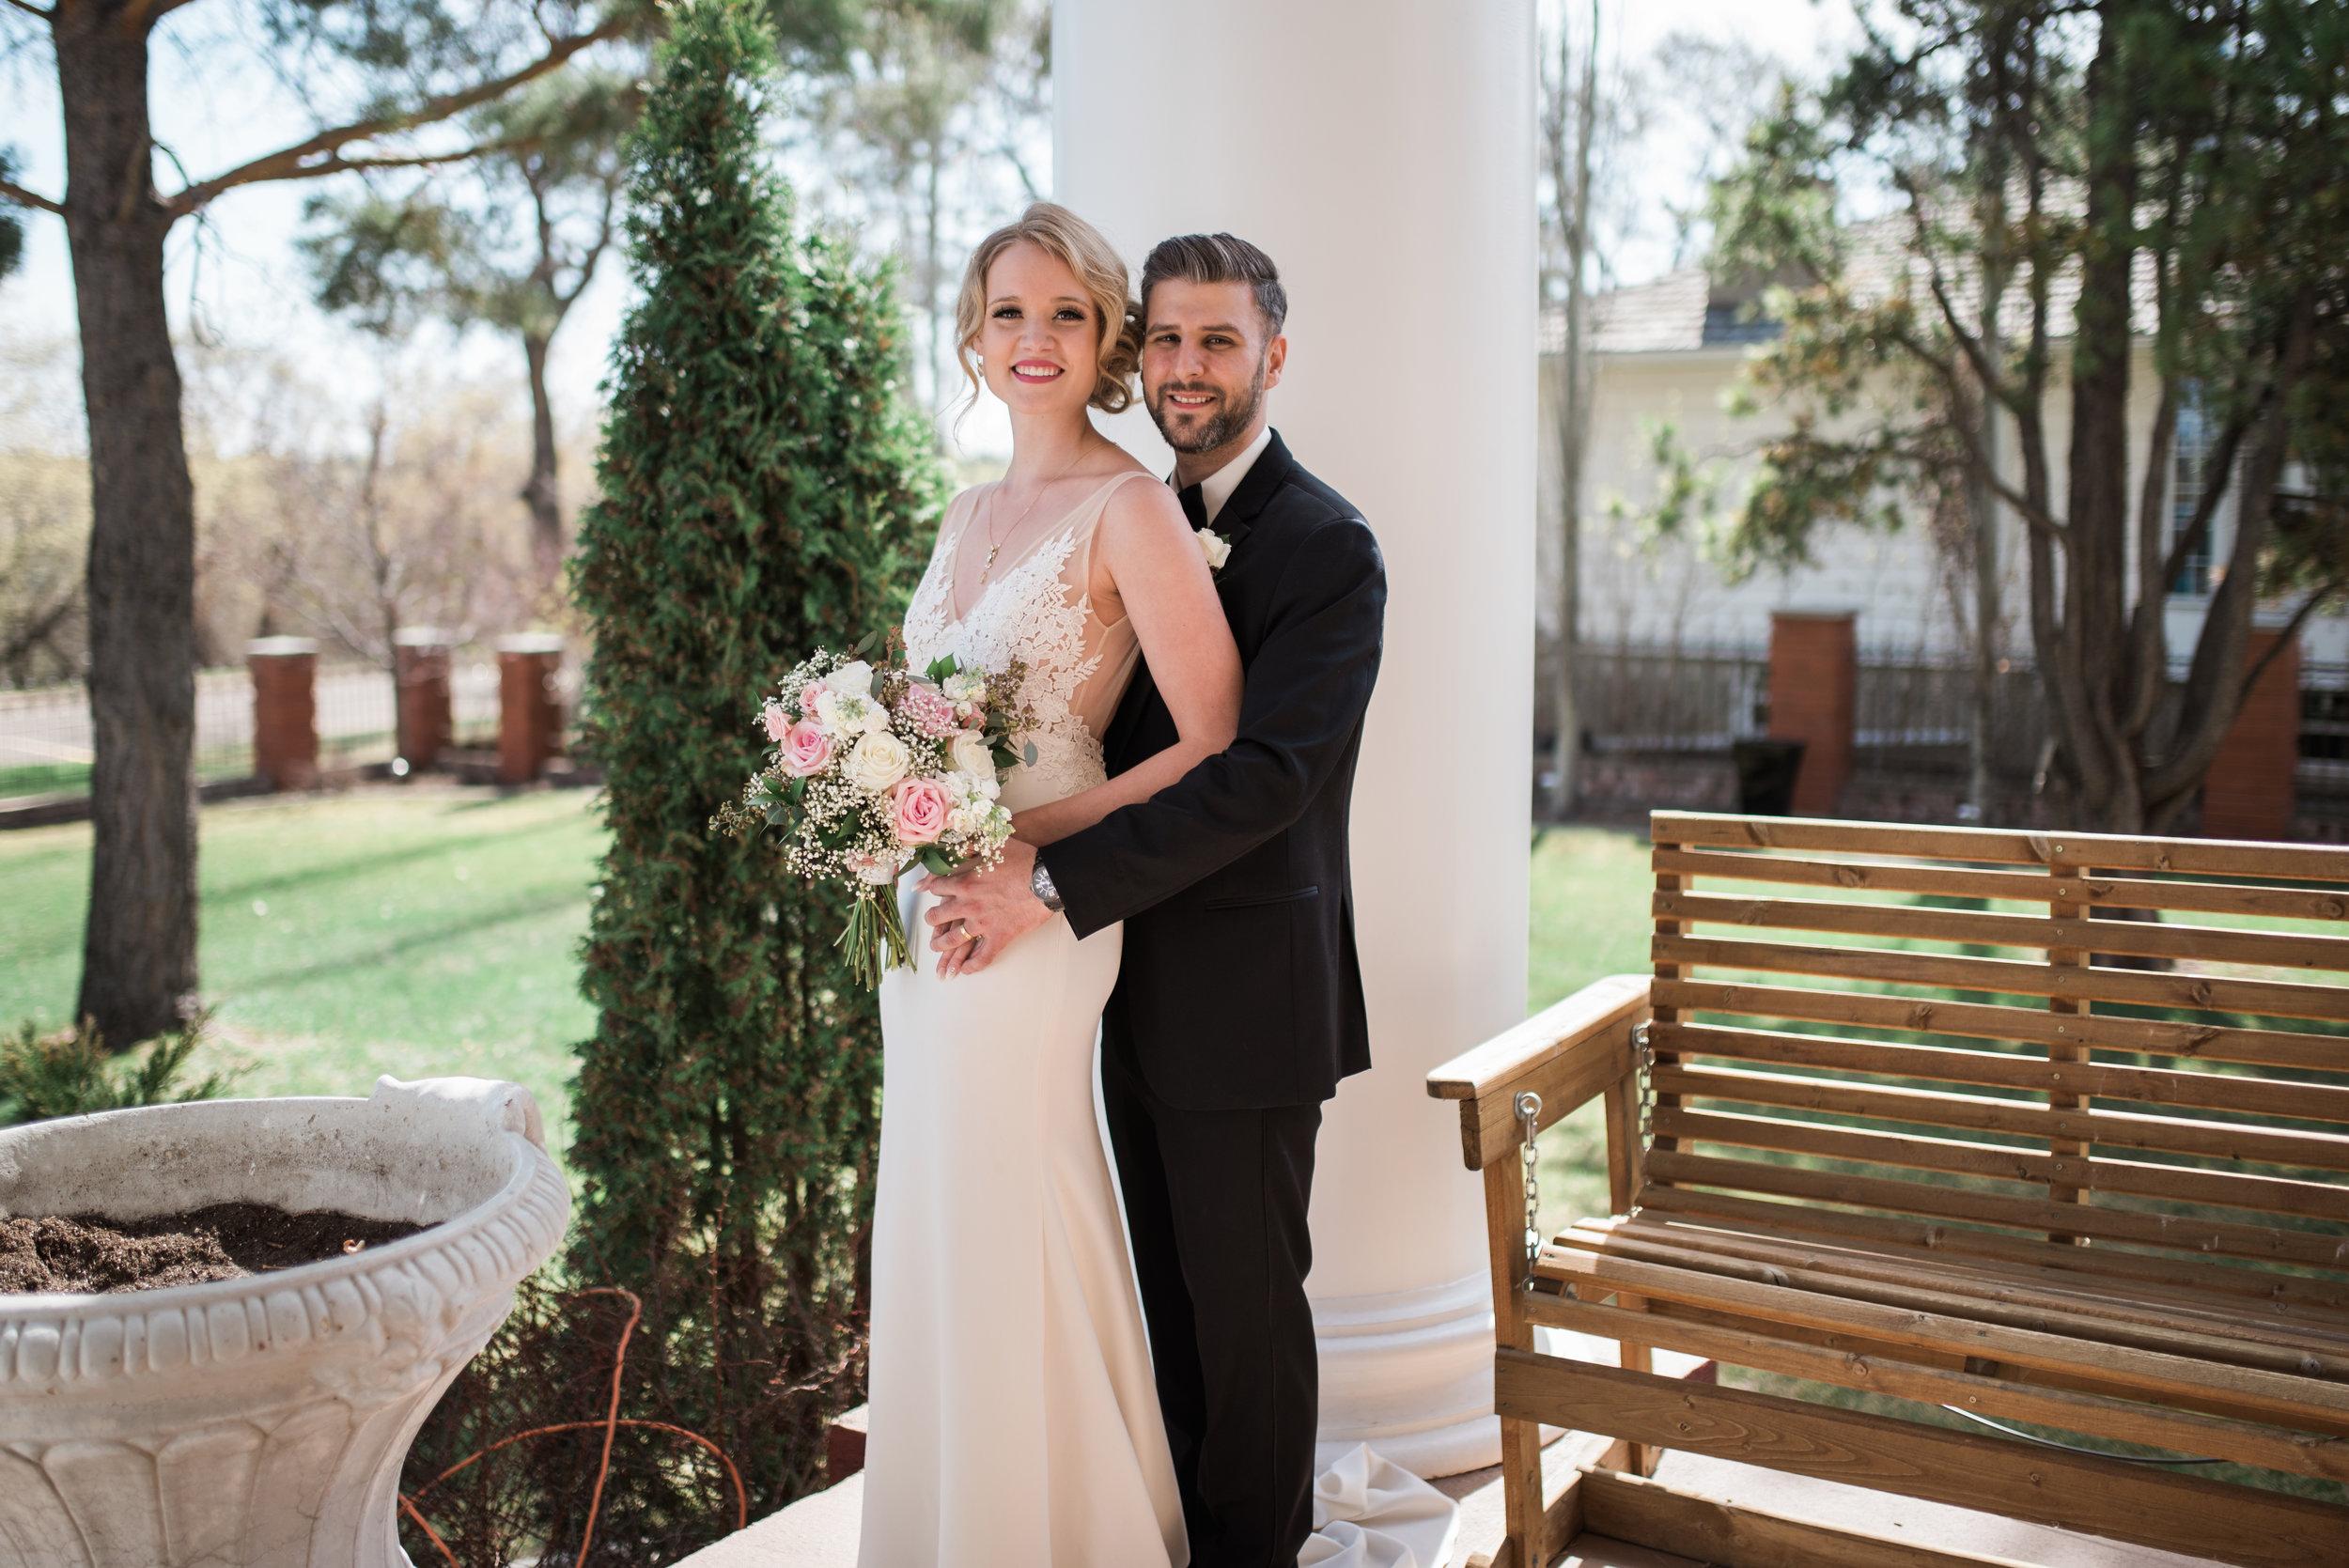 Ali Samantha Wedding 1095.jpg